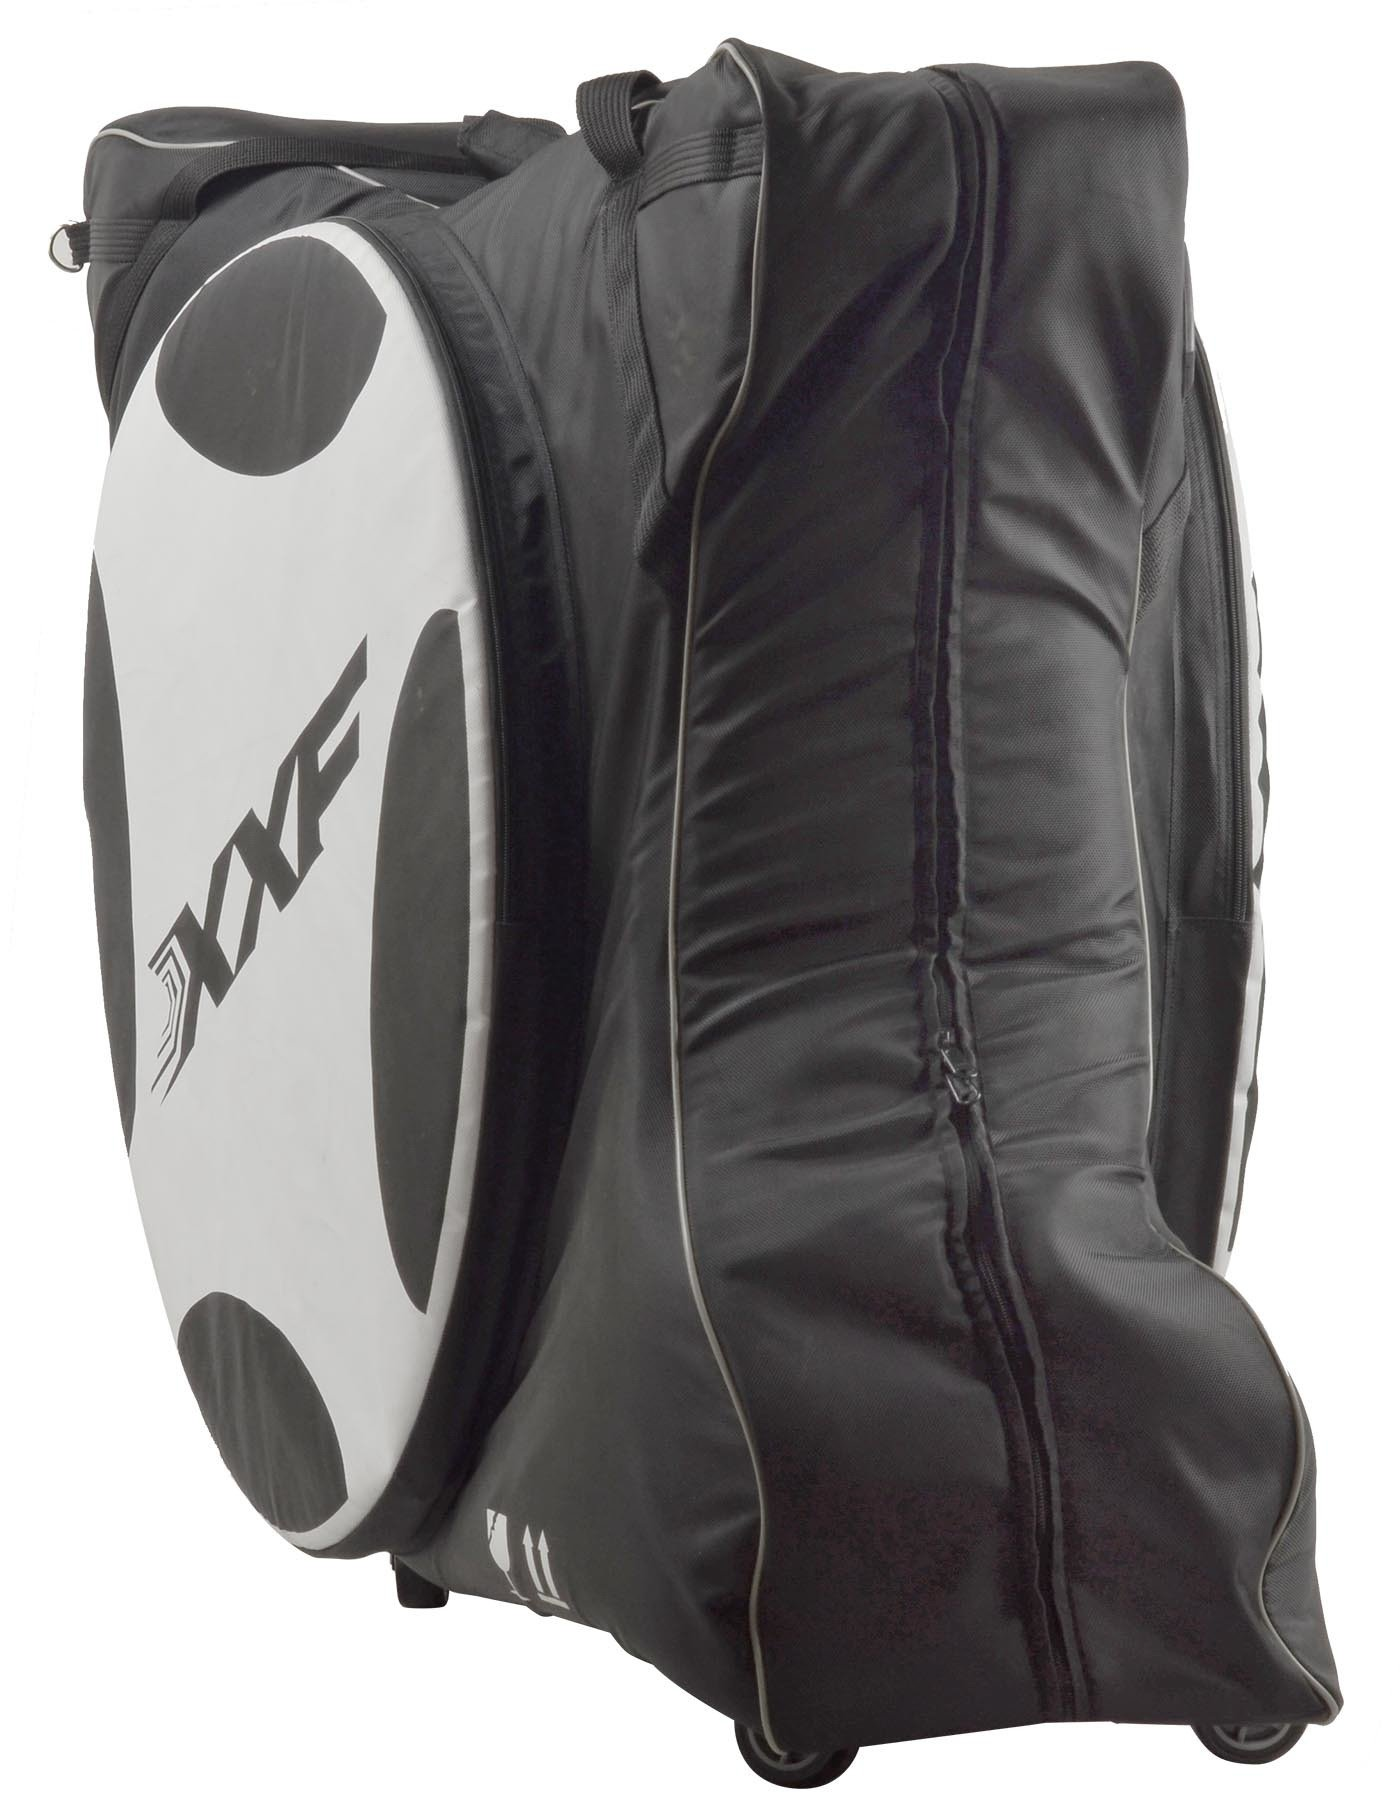 "XXF Transport Travel Bike Carry Bag Nylon Pad for 700c Road Bike 26"" 27.5"" 29"" MTB"